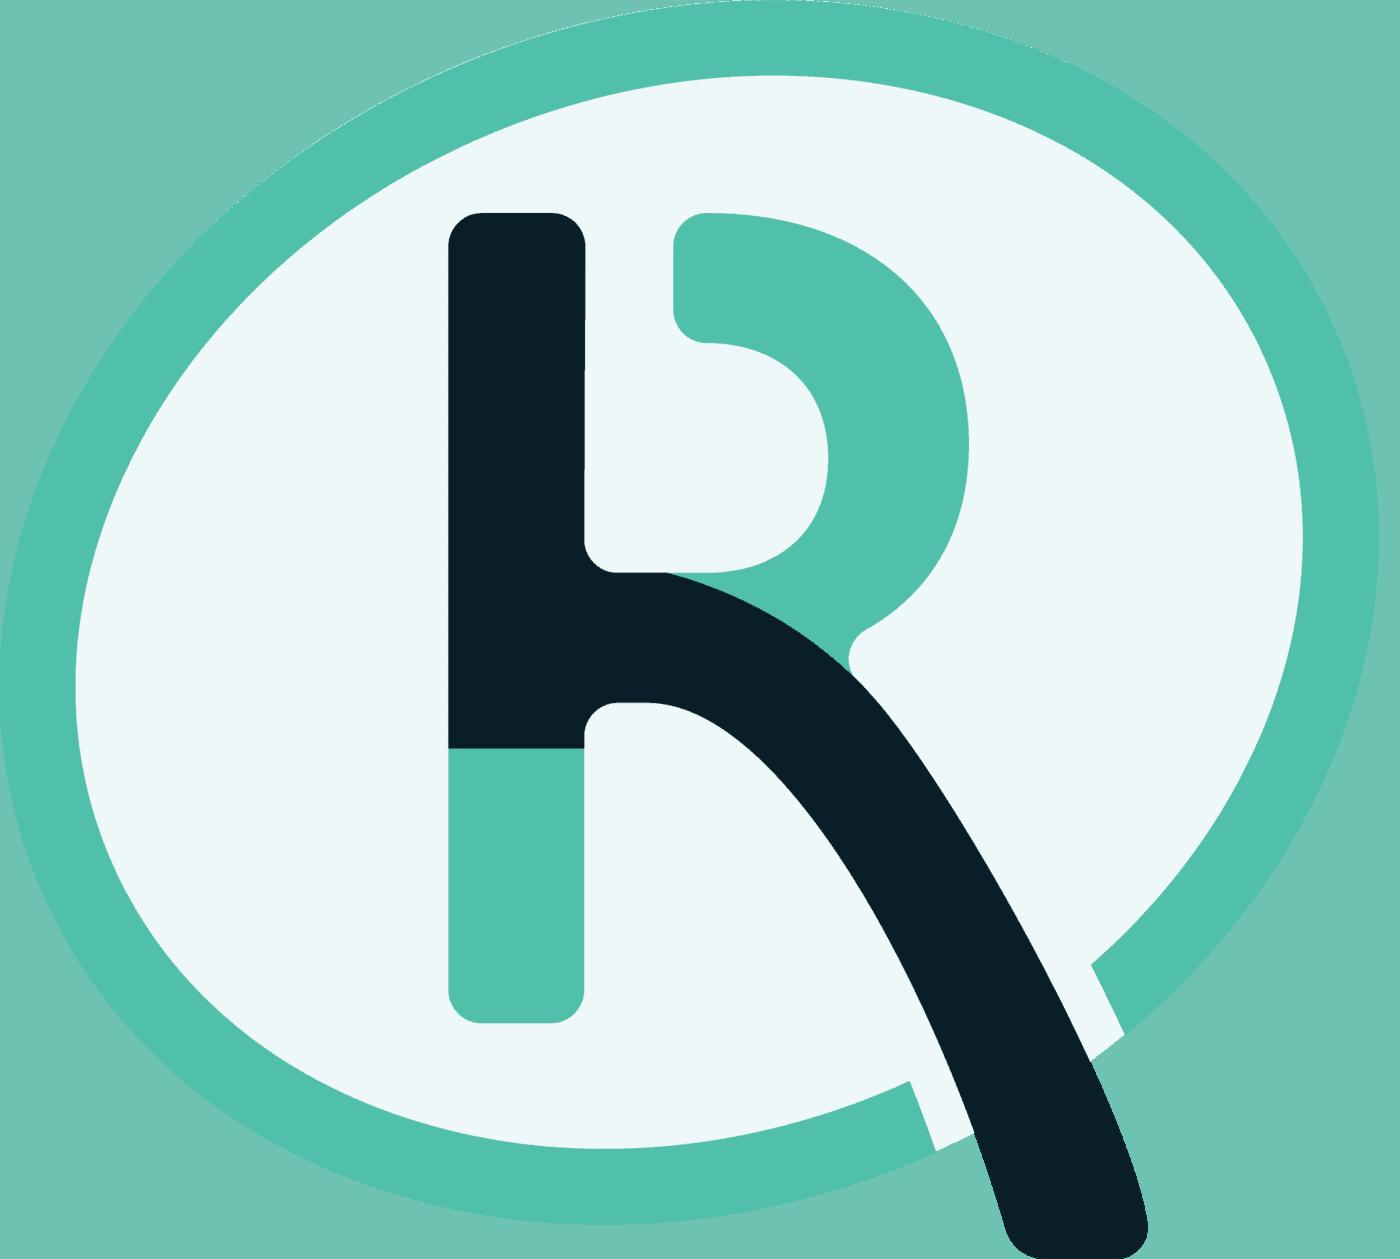 recombia brandmark color 1